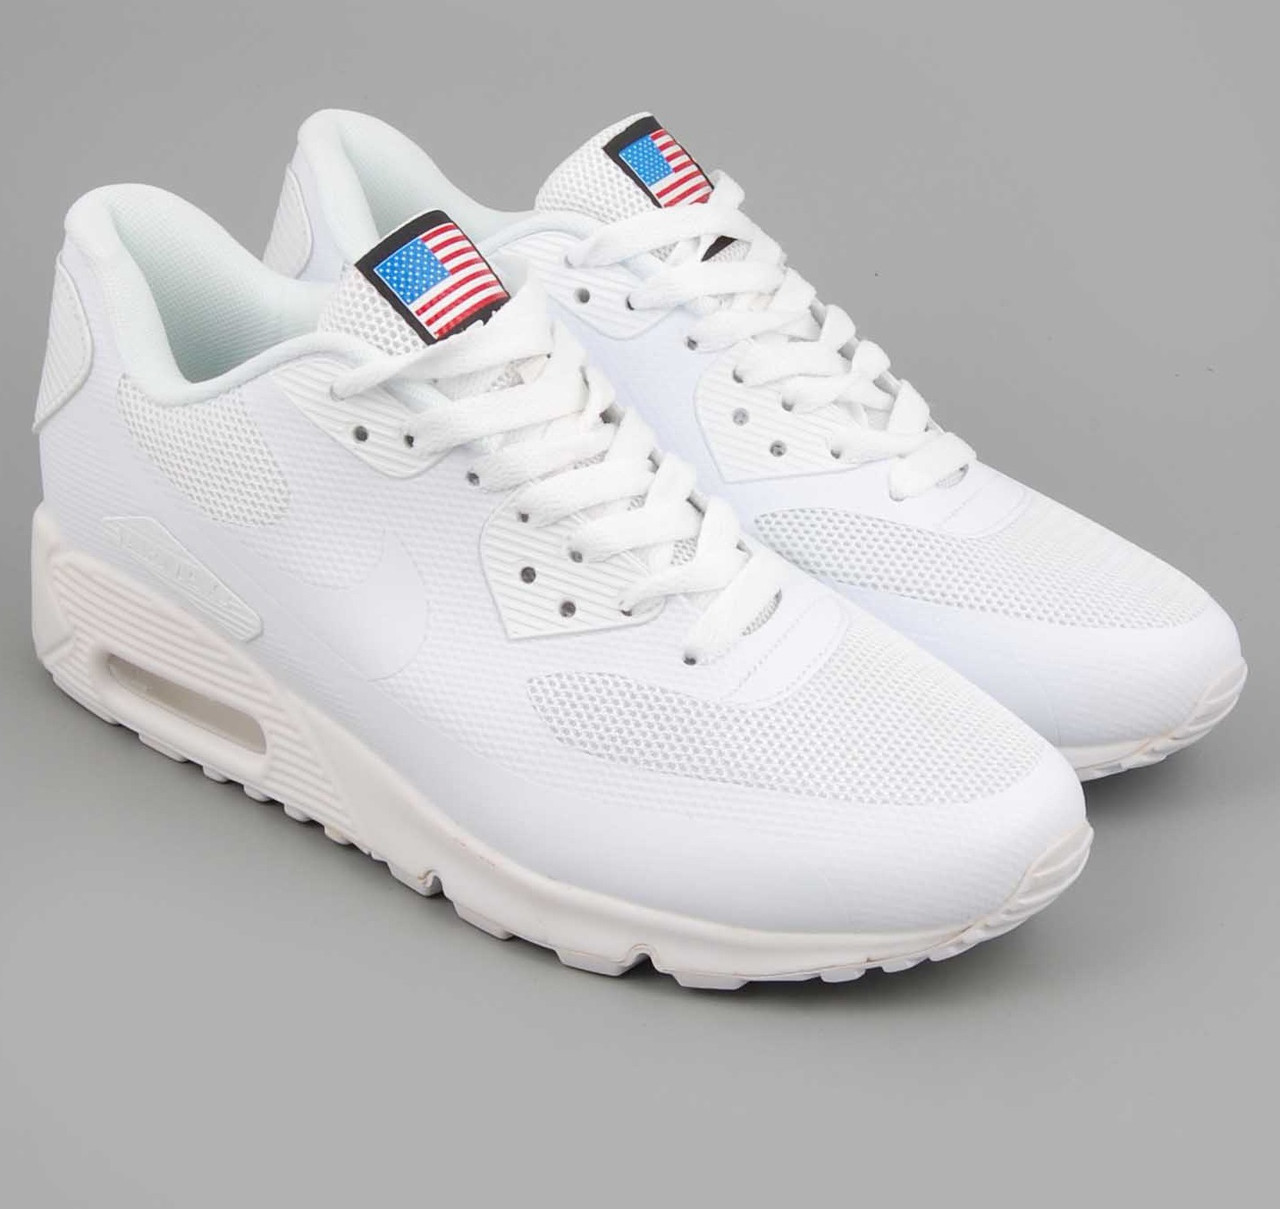 b567ee32 Кроссовки Nike Air Max 90 Hyperfuse Independence Day - Торговая площадка